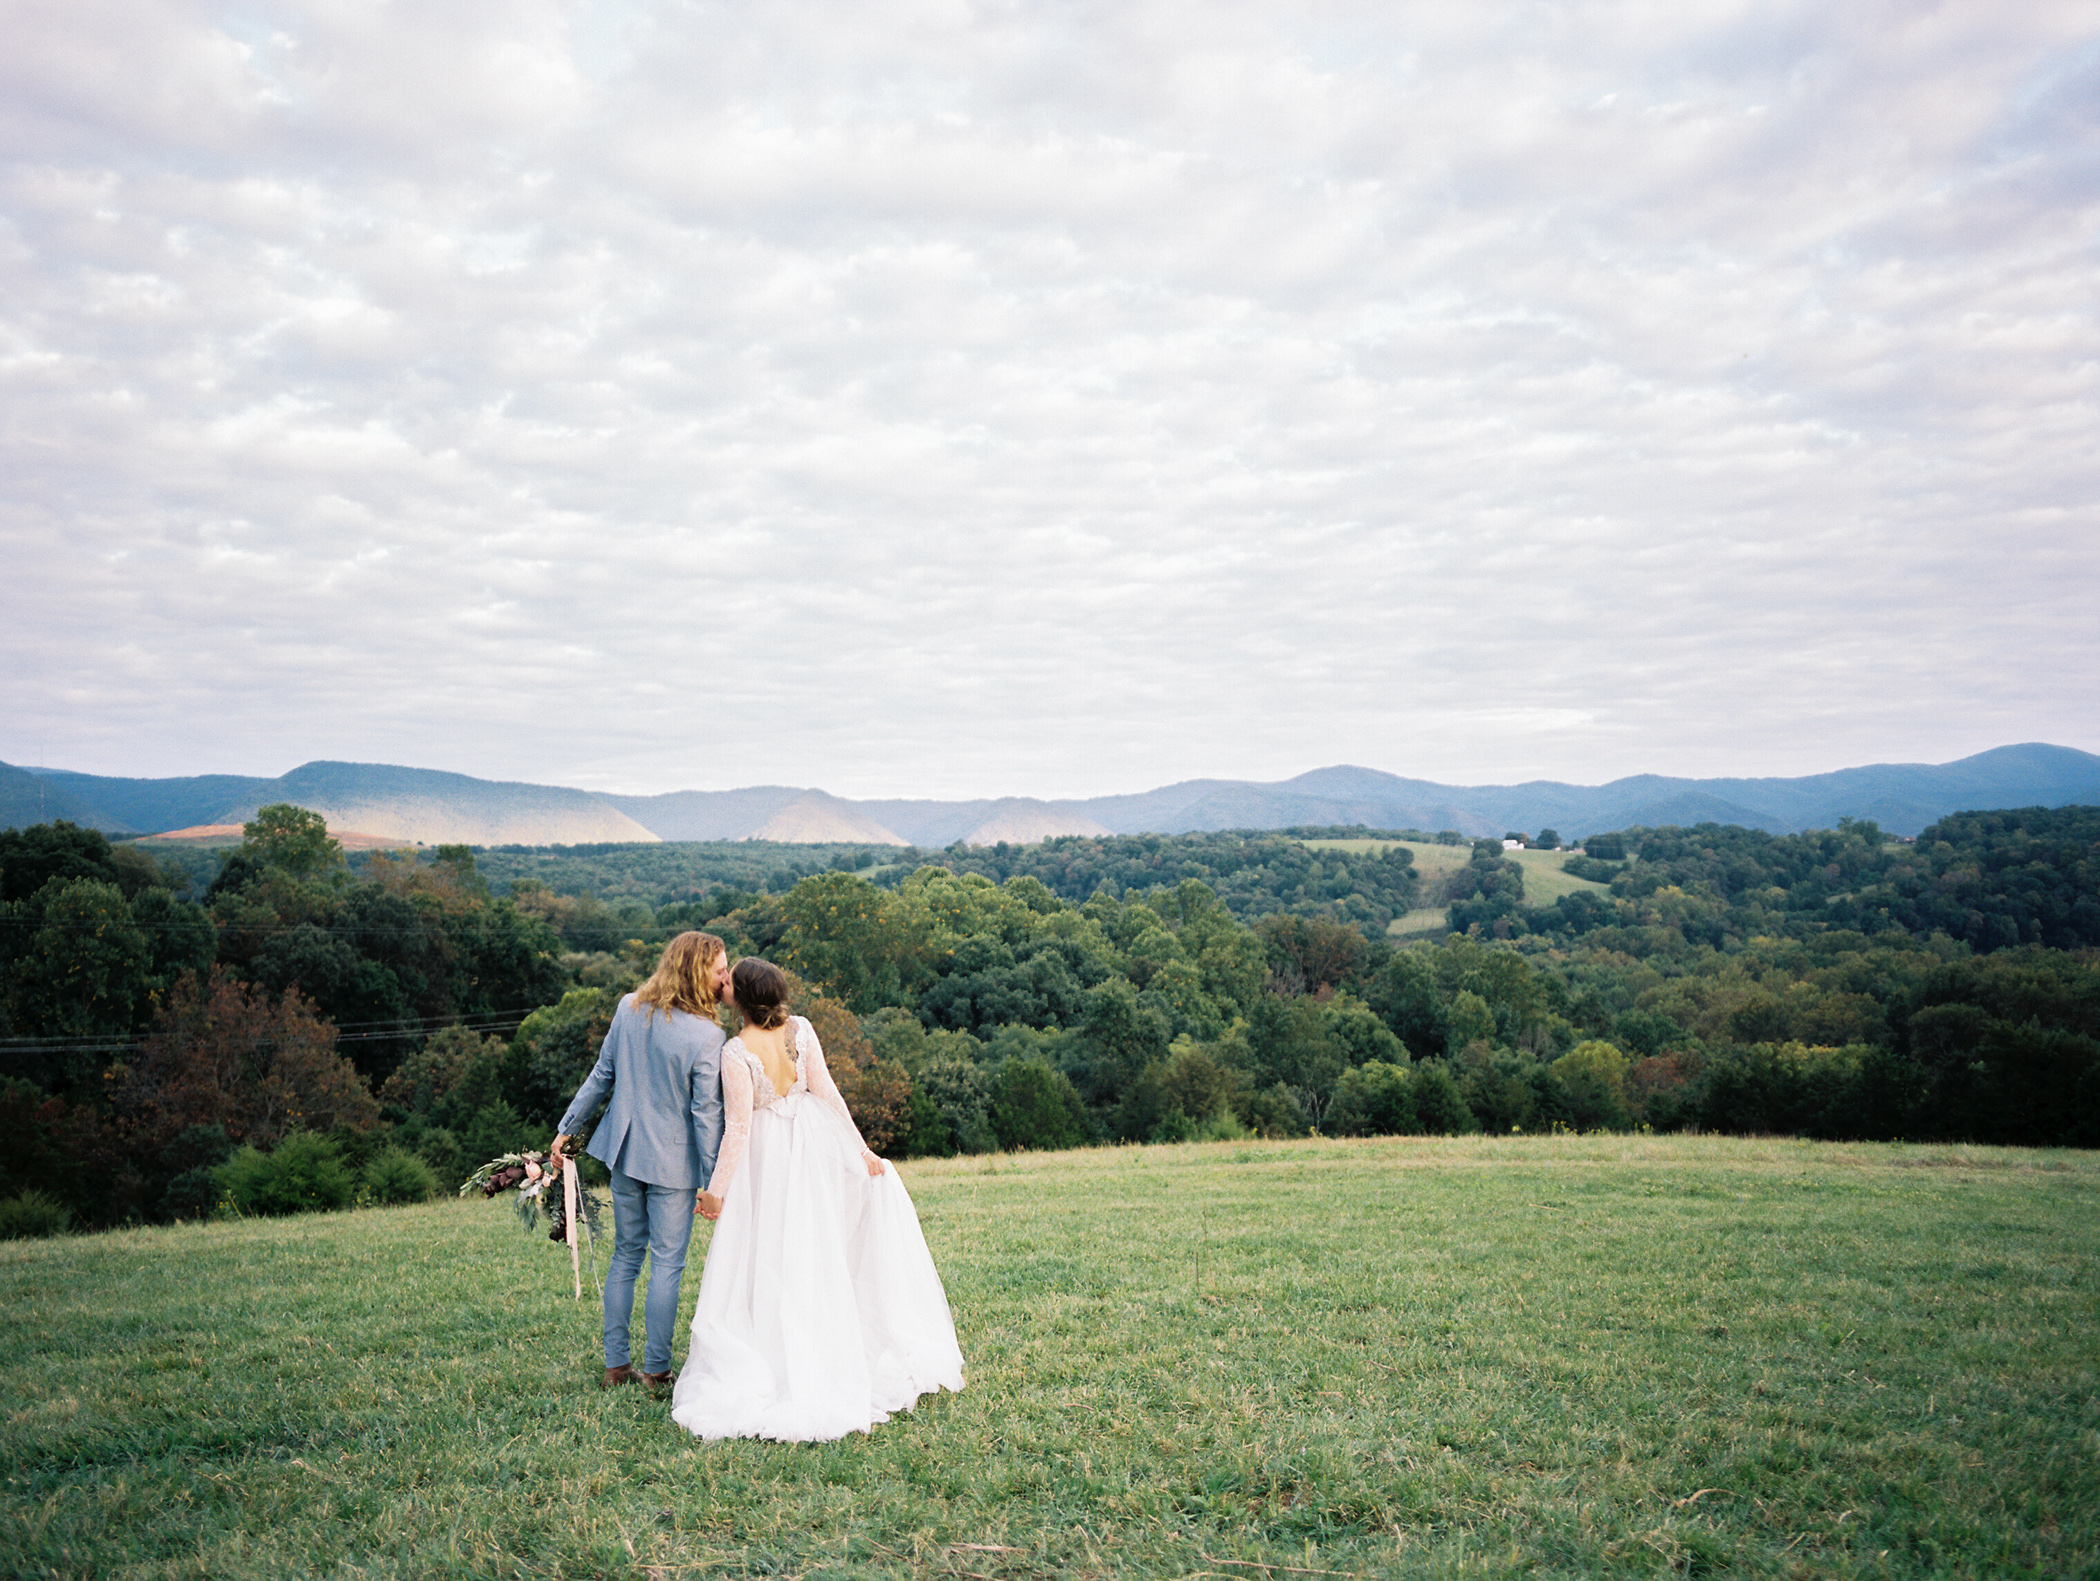 Charlotte-Film-Wedding_Photographer-heartstone-lodge-virginia-39.jpg